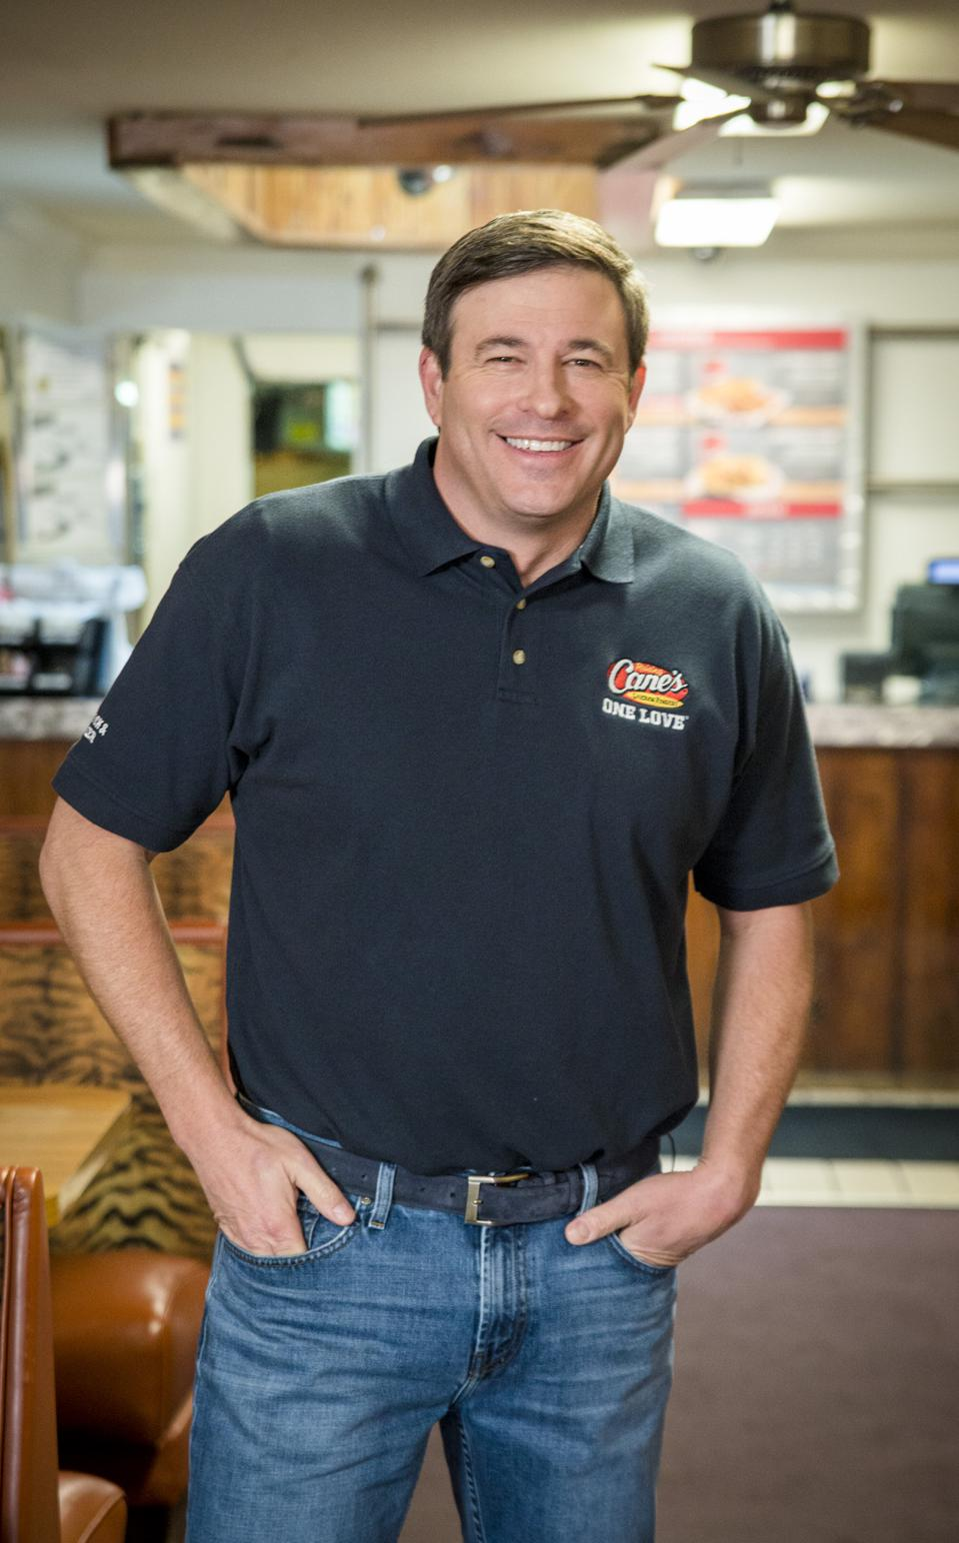 Raising Cane's founder/co-CEO Todd Graves